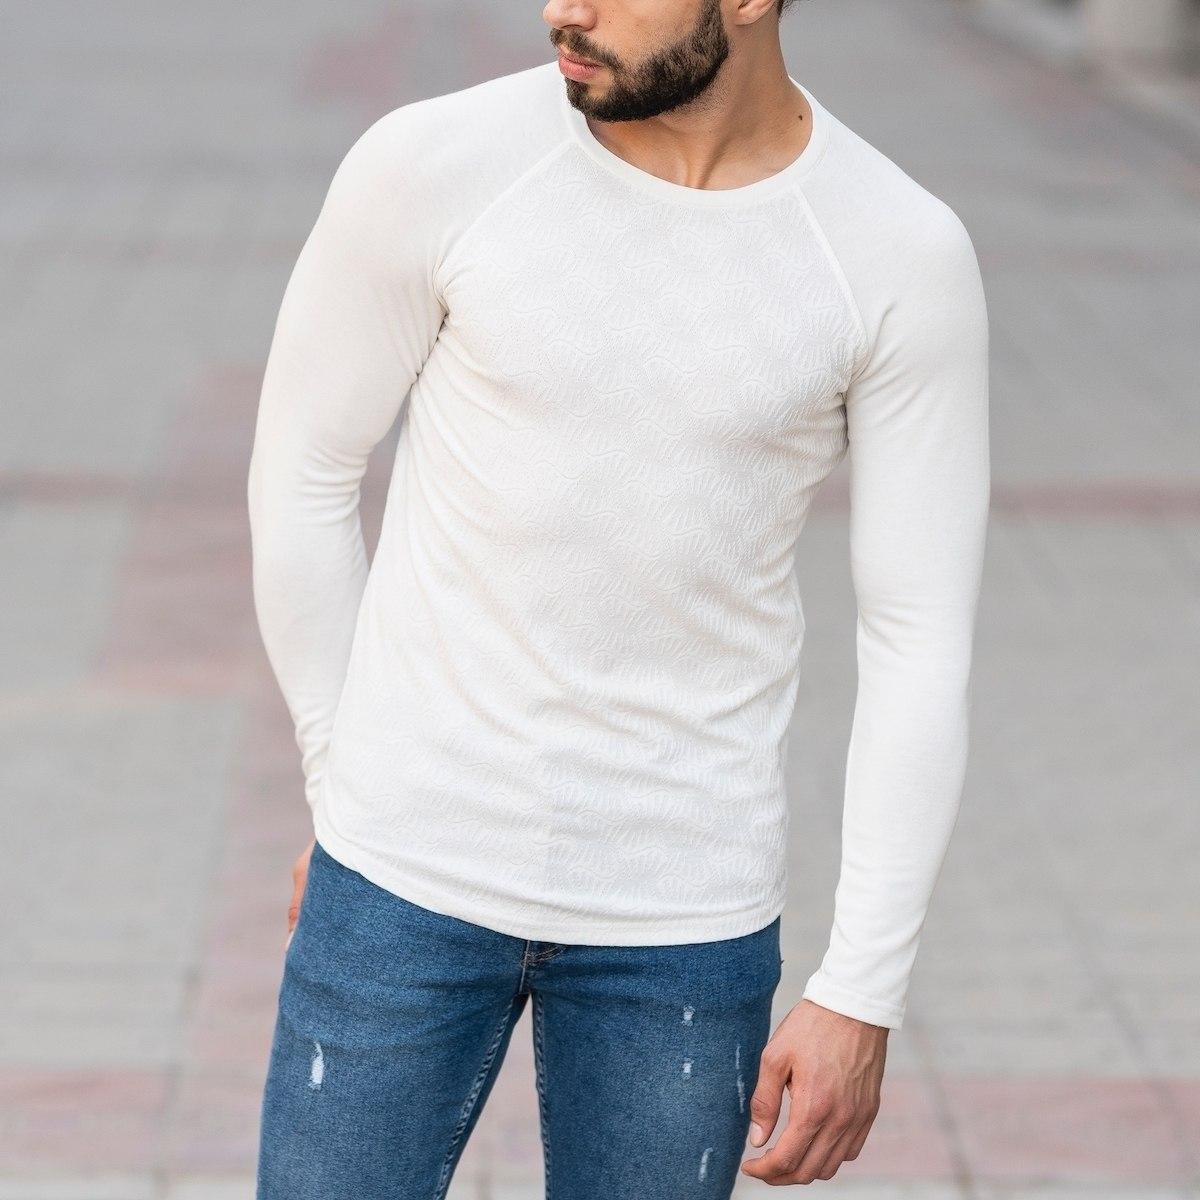 Engraved Sweatshirt In White Mv Premium Brand - 2